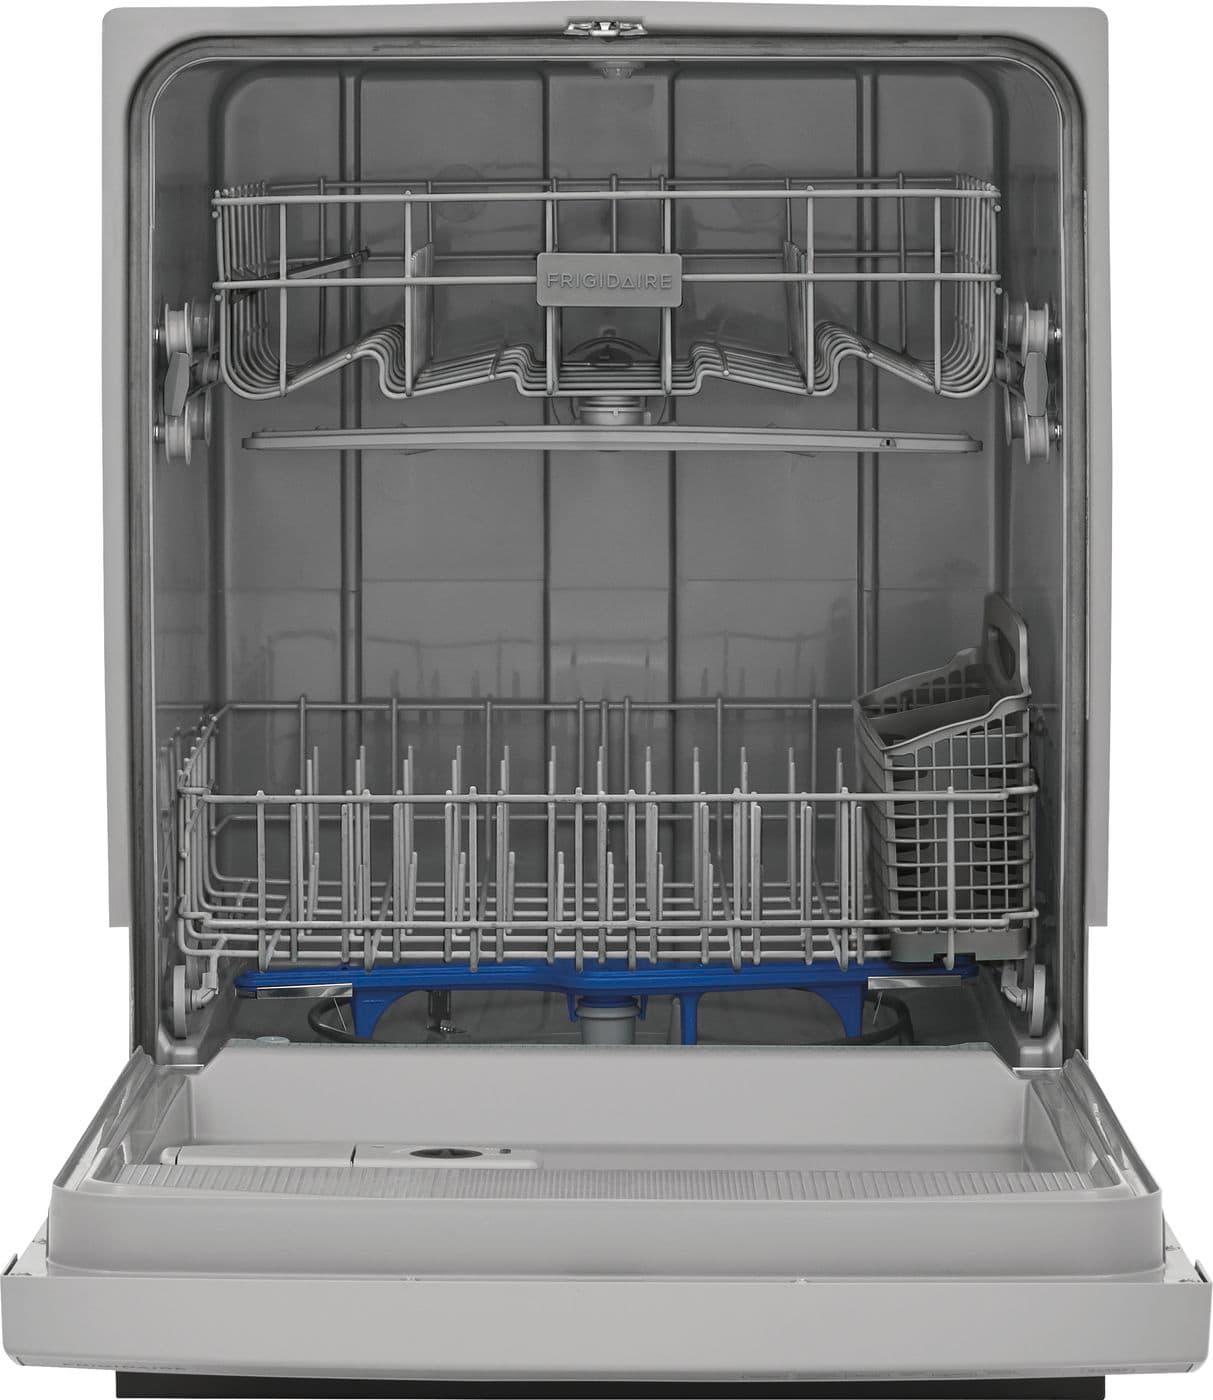 "Model: FFCD2418US | Frigidaire 24"" Built-In Dishwasher"